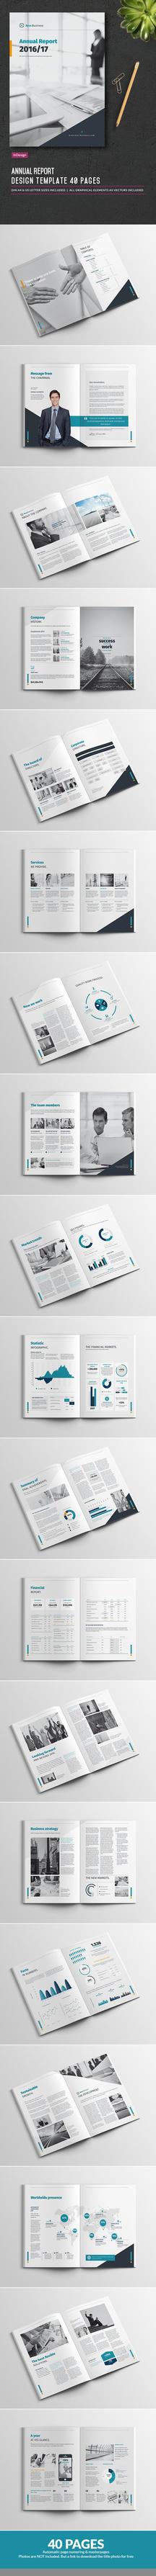 Annual Report 2016/17 by imagearea